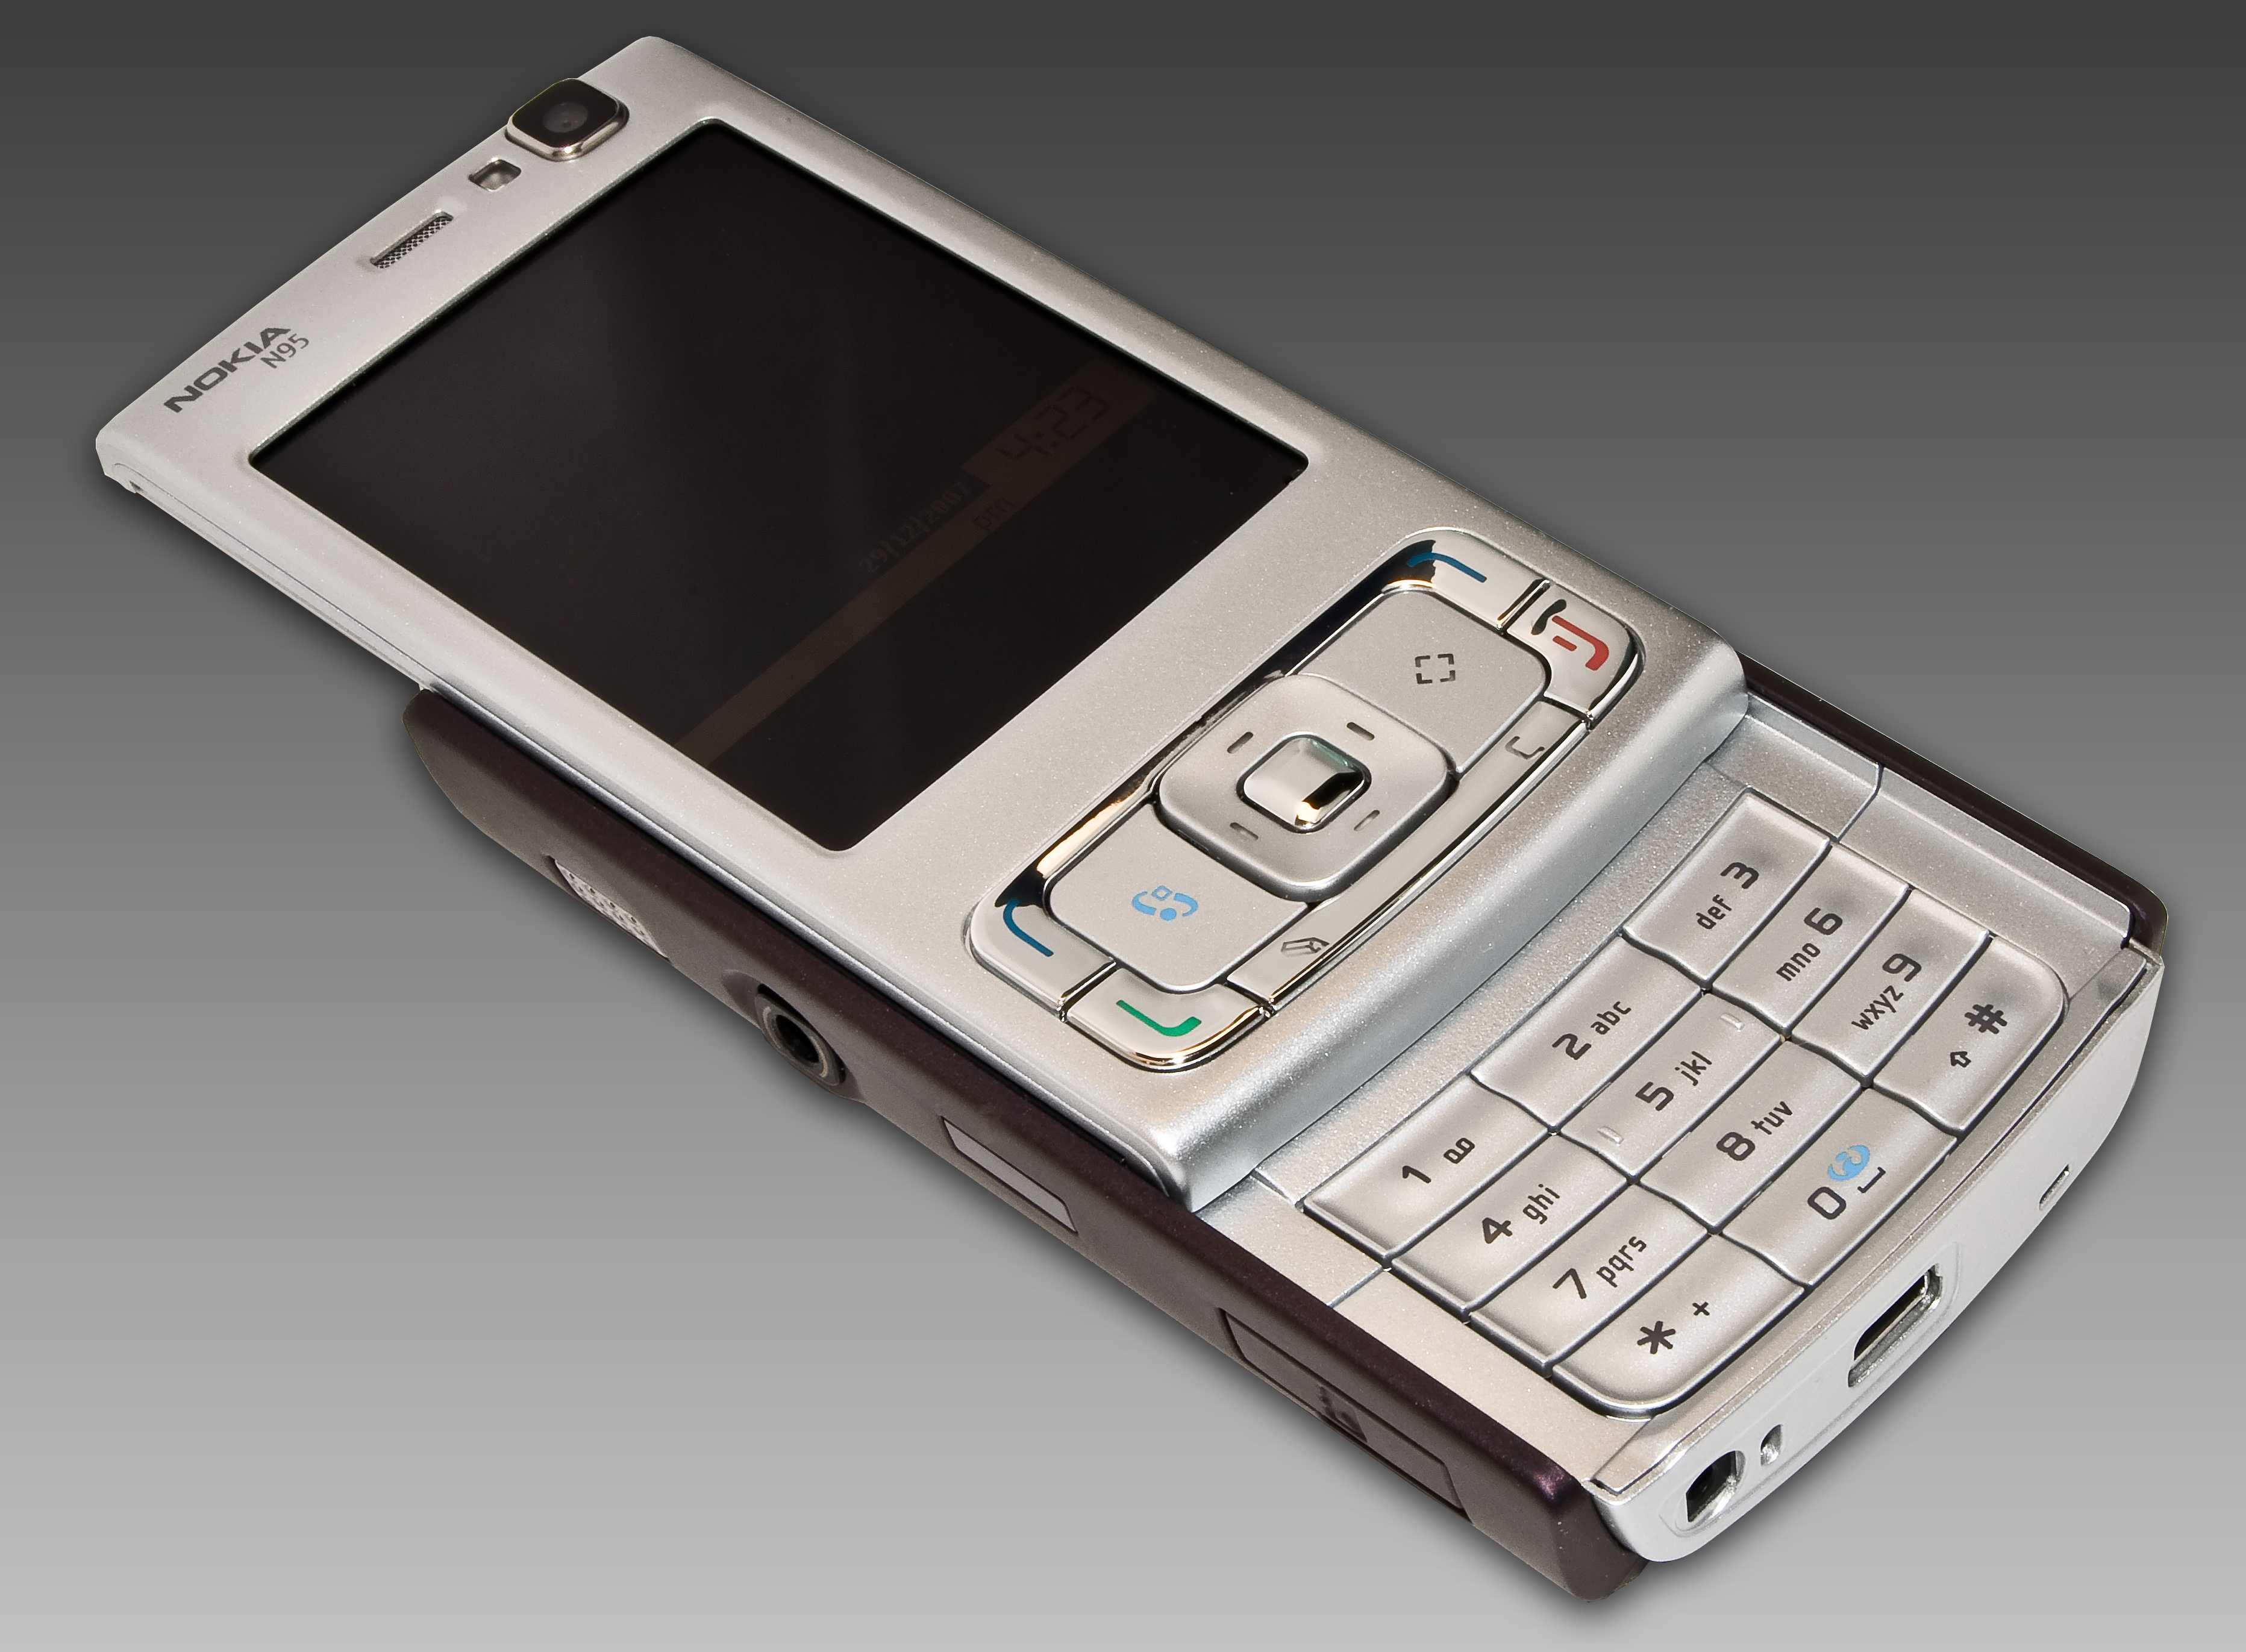 N95 Front slide open